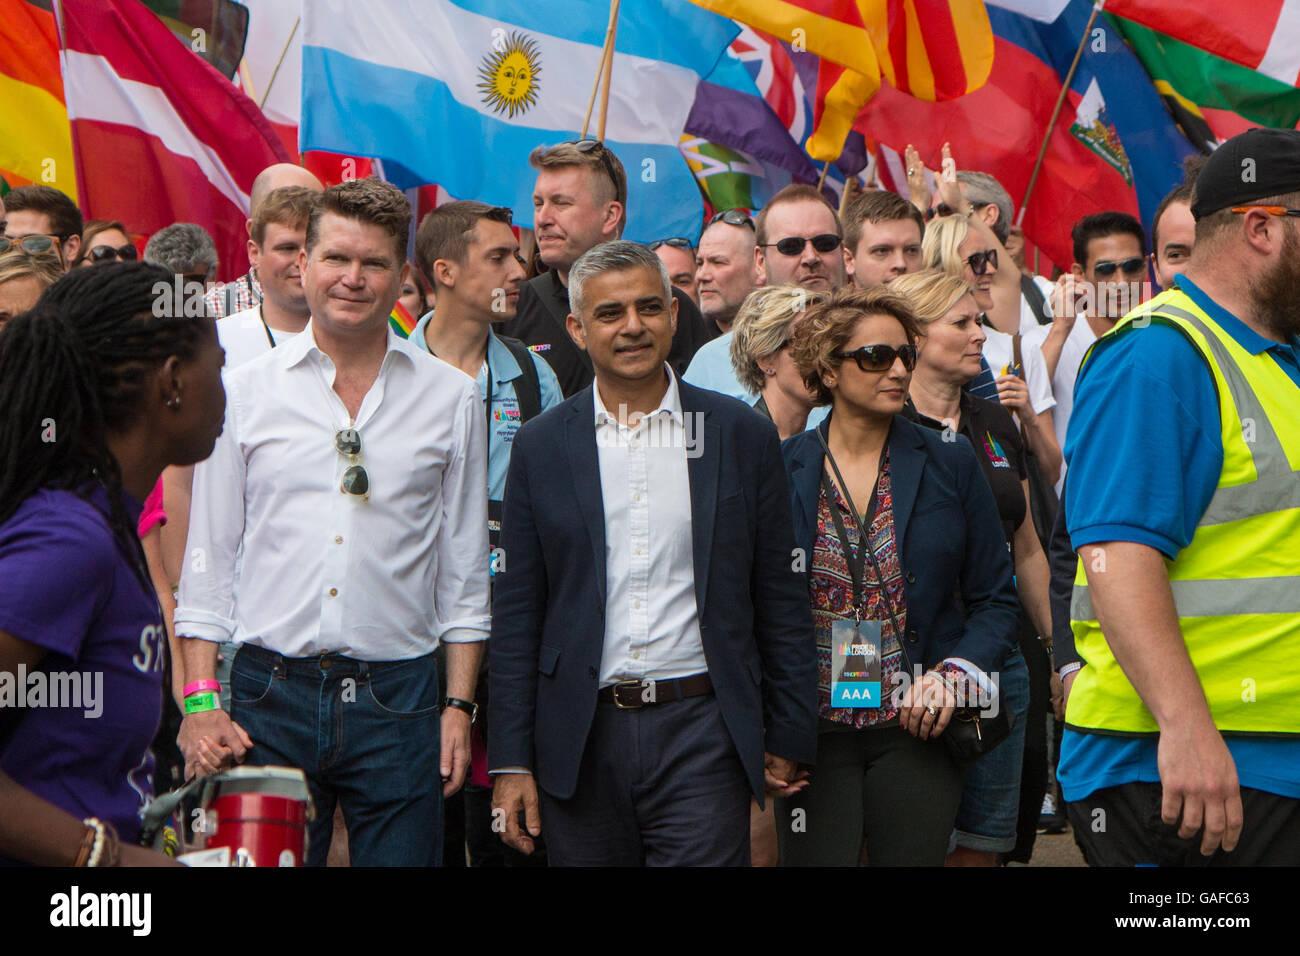 US Ambassador, Sadiq Khan (mayor of London) and his wife at Pride in London 2016 Stock Photo